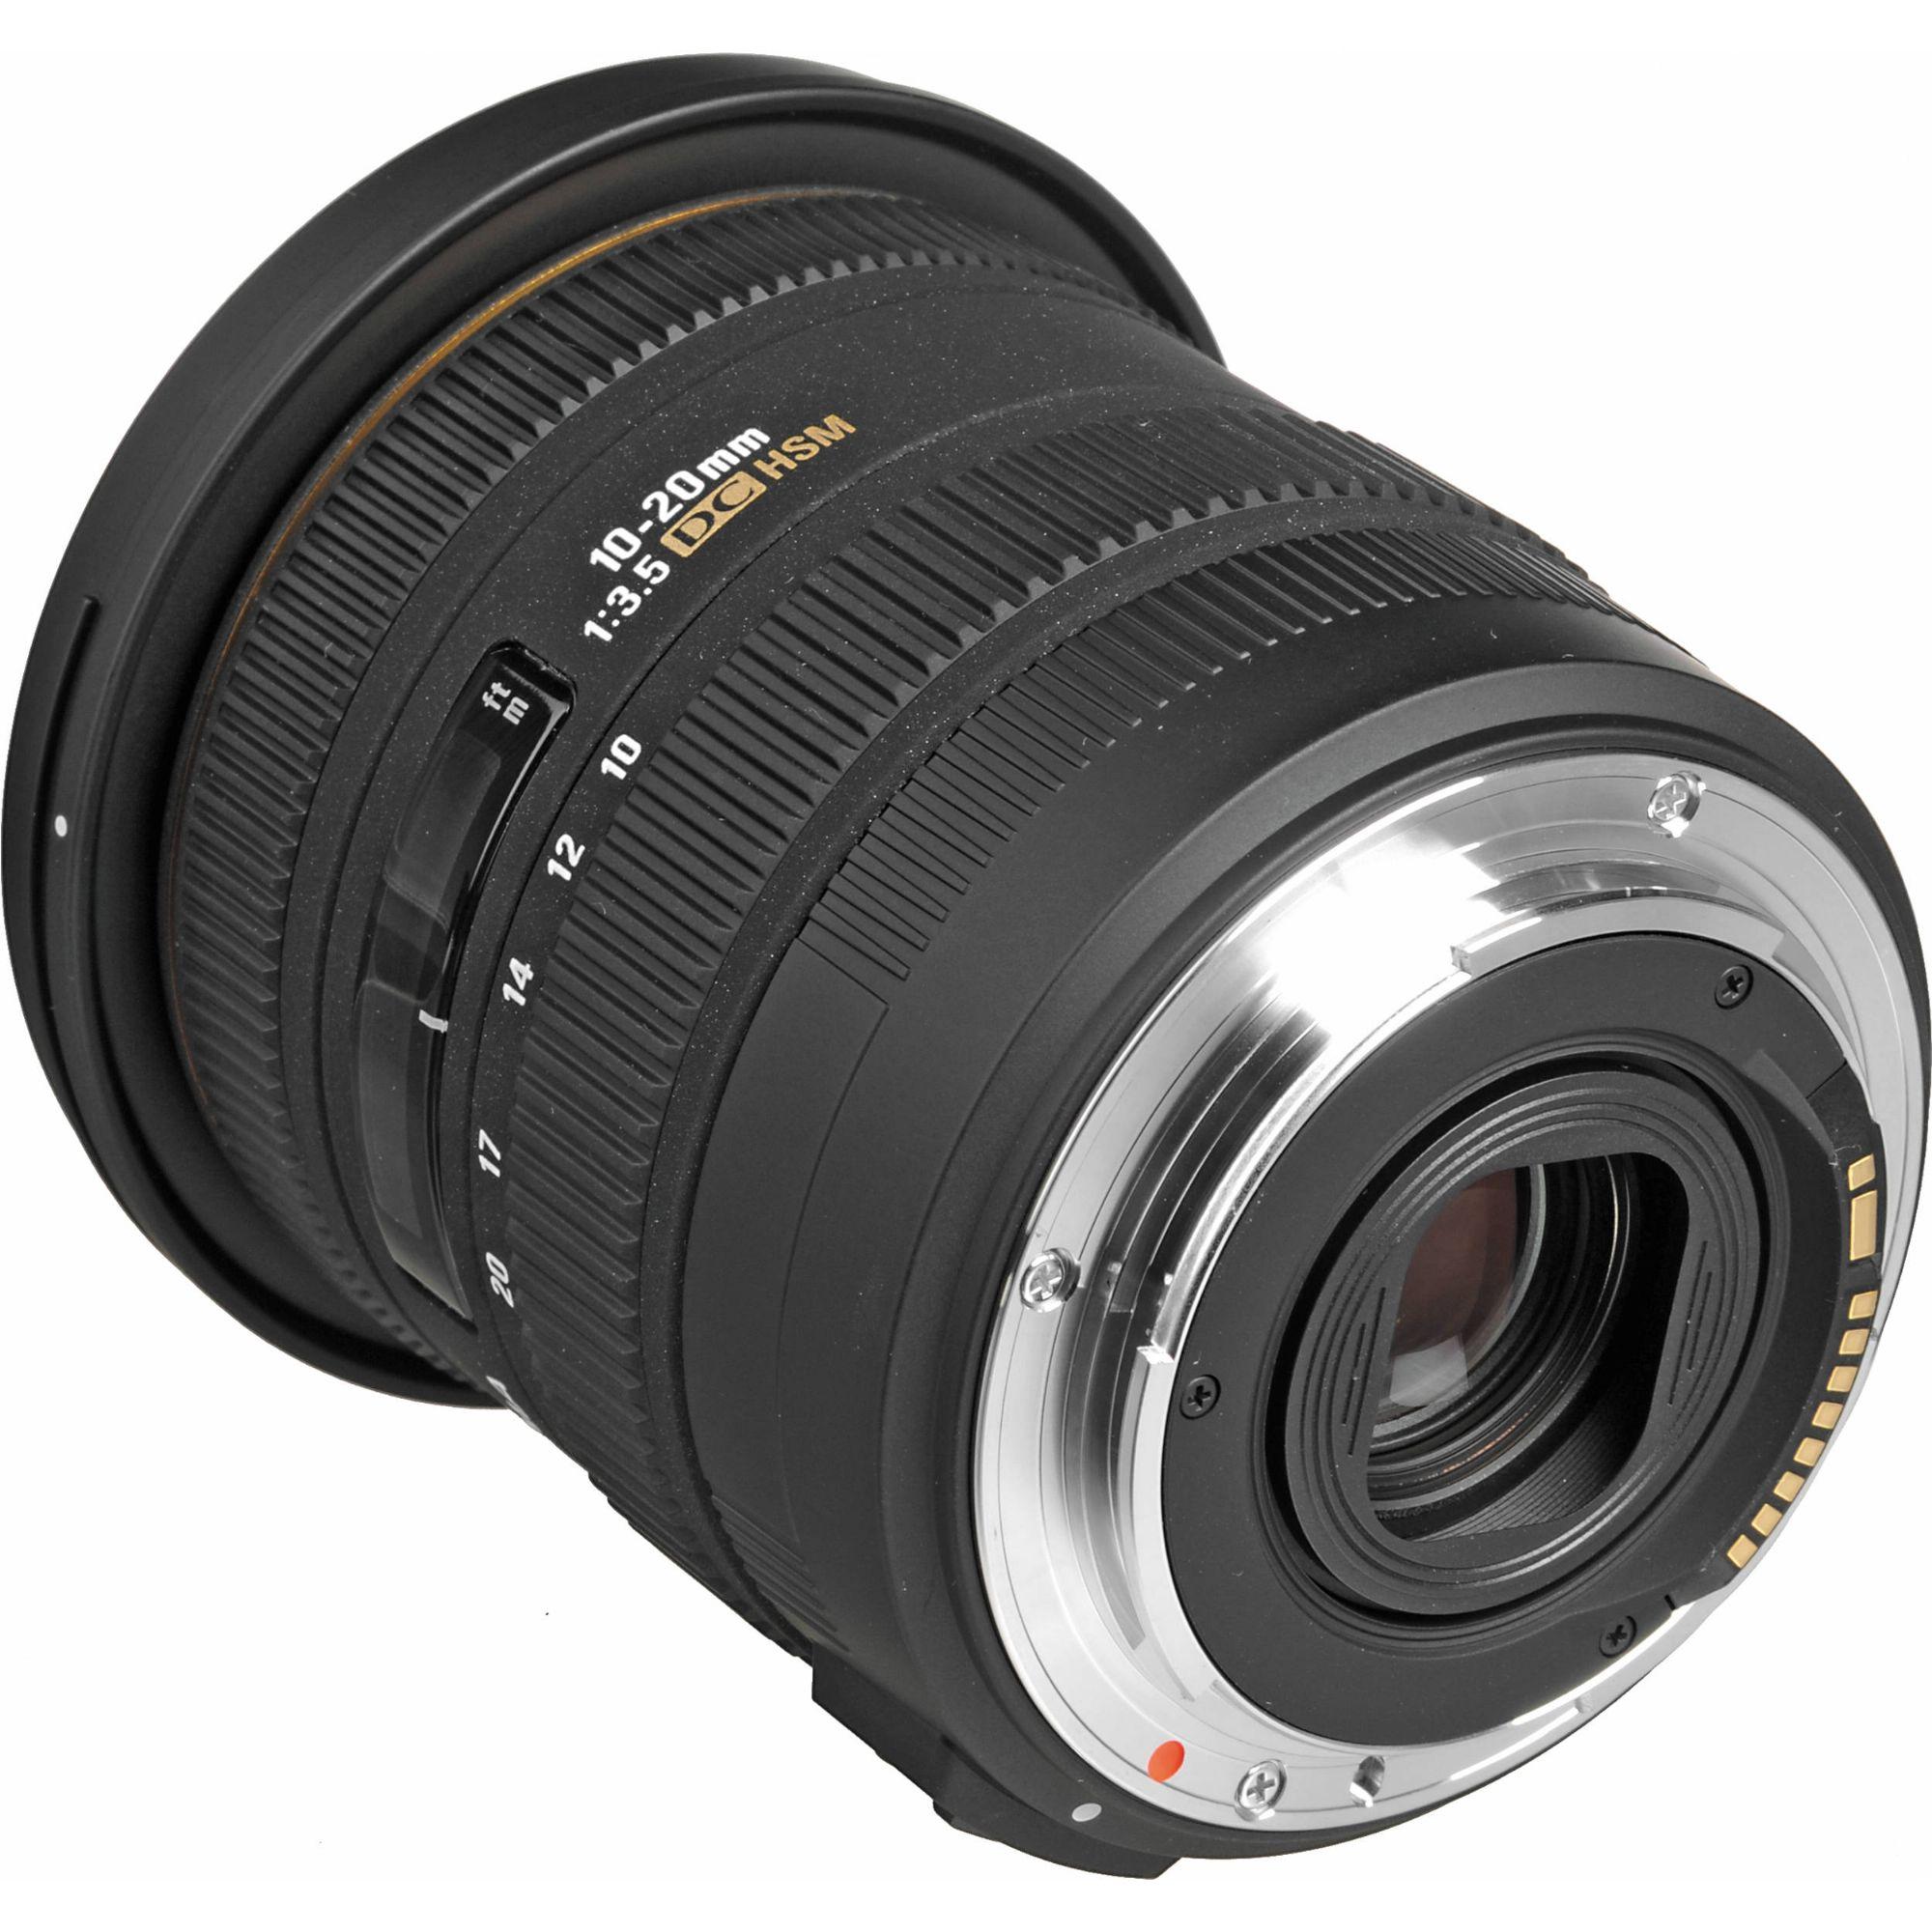 Sigma 10-20mm F3.5 EX DC HSM A-mount lens info